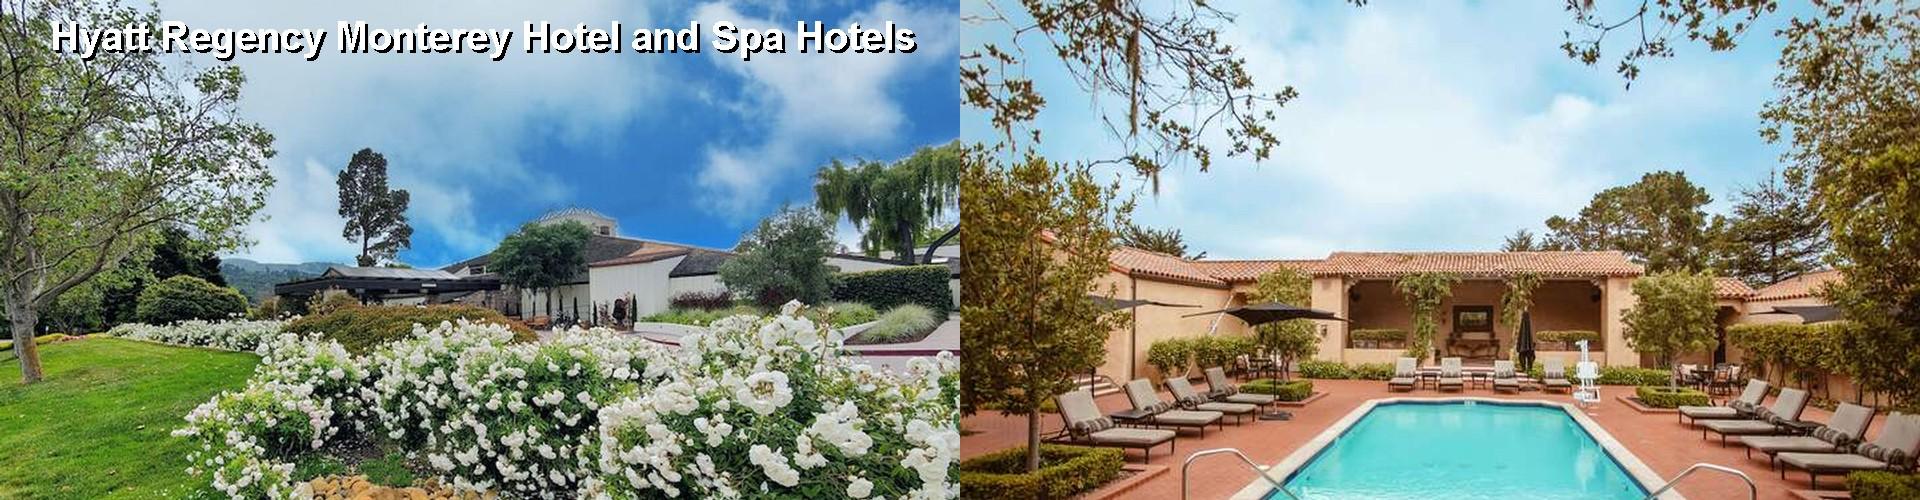 60 Hotels Near Hyatt Regency Monterey Hotel And Spa Ca